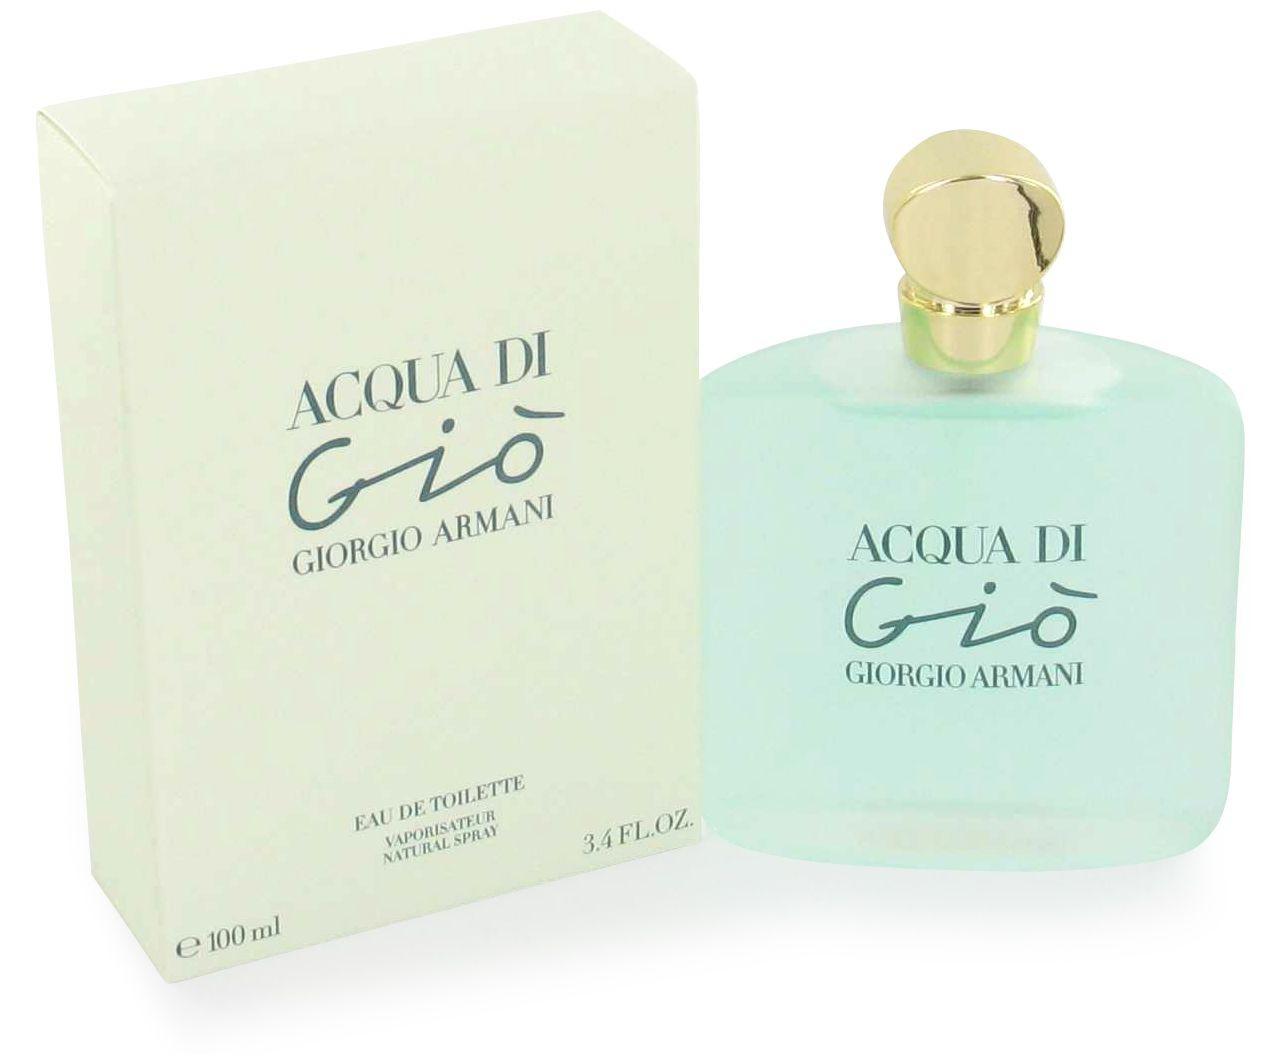 Armani Acqua di Gio аромат для женщин